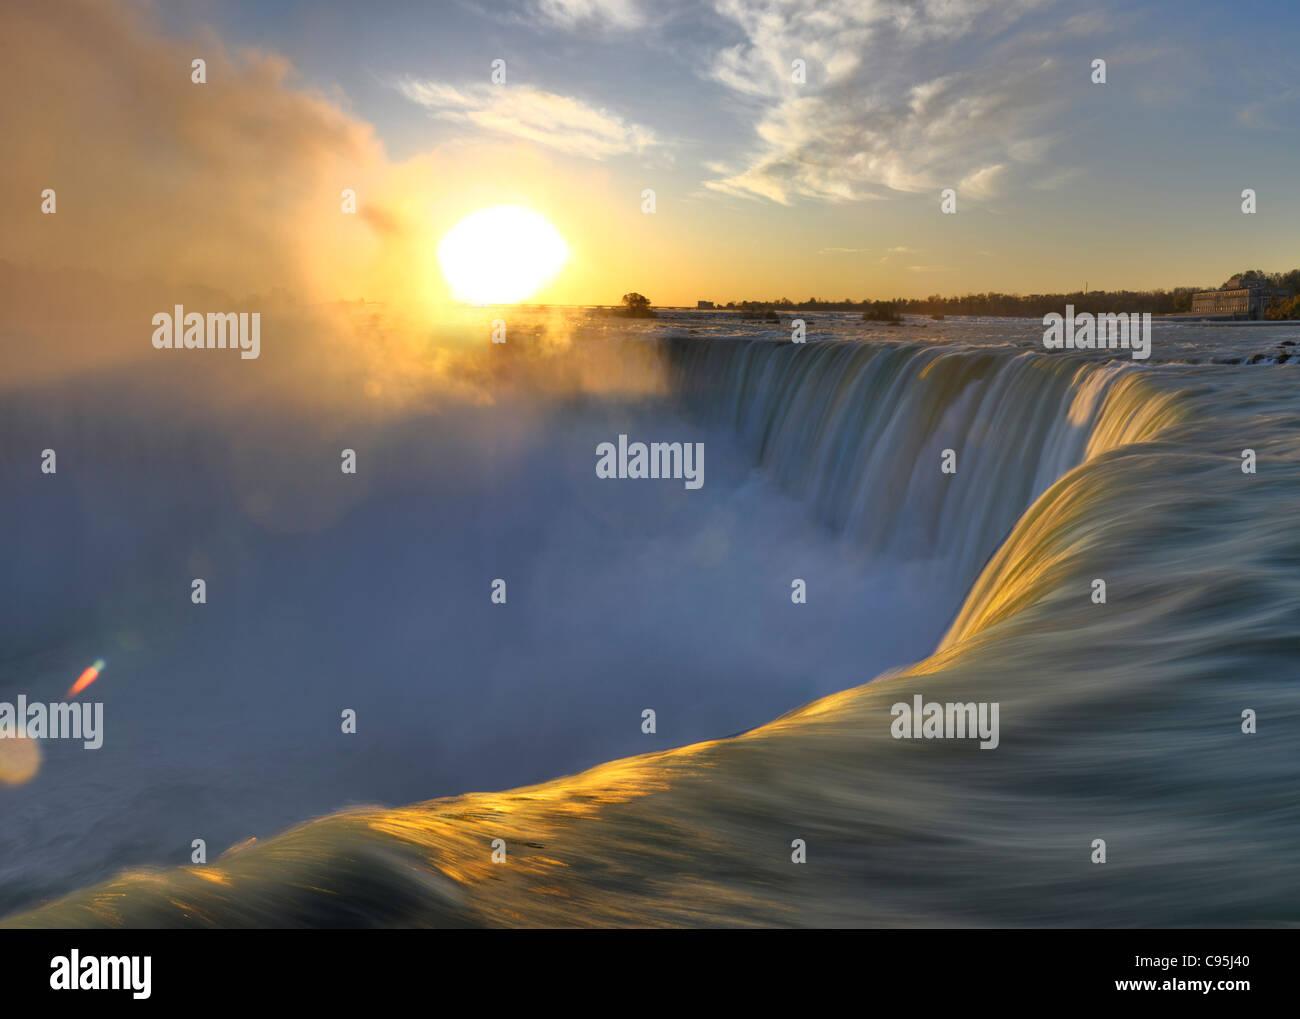 Rande des kanadischen Horseshoe Niagara Falls bei Sonnenaufgang. Niagara Falls Ontario Kanada. Stockbild